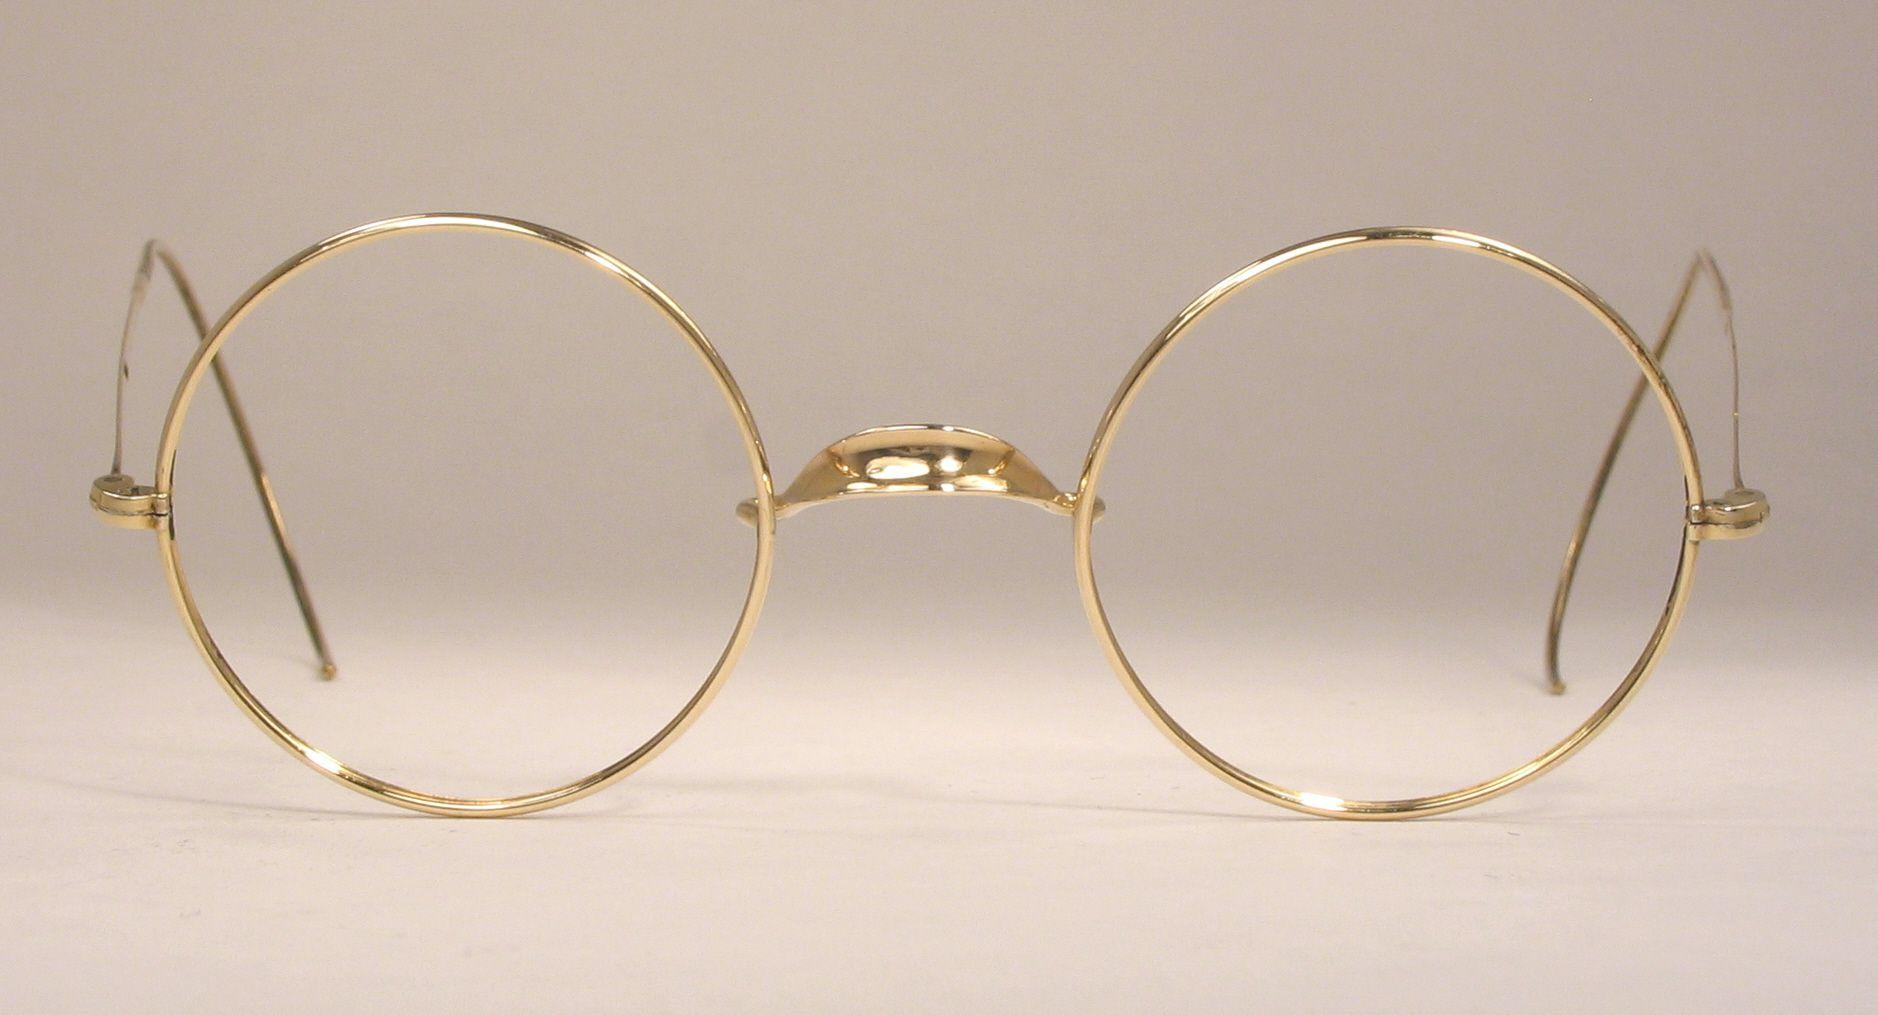 Vintage spectacles Vintage glasses